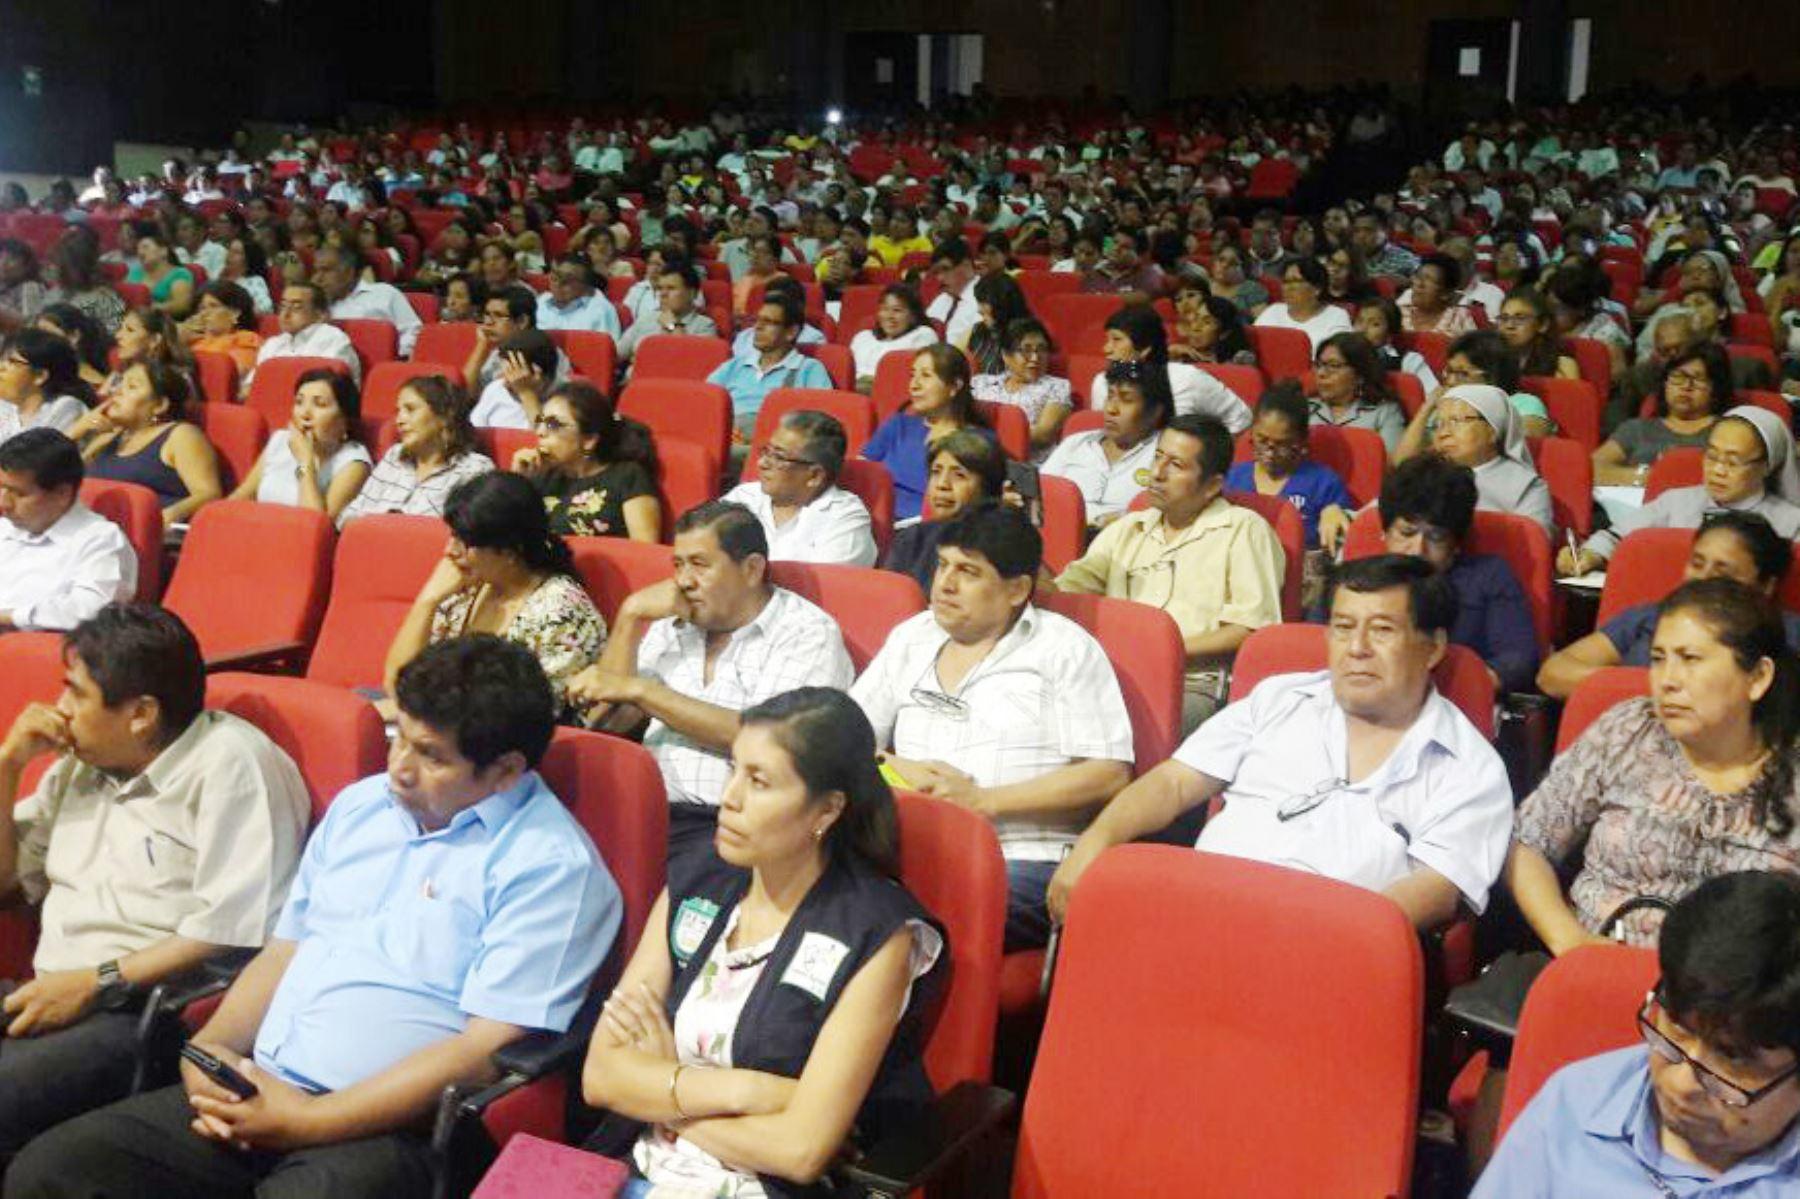 Ministerio de Educación capacitana directores y docentes de Ica para prevenir violencia contra escolares. ANDINA/Difusión